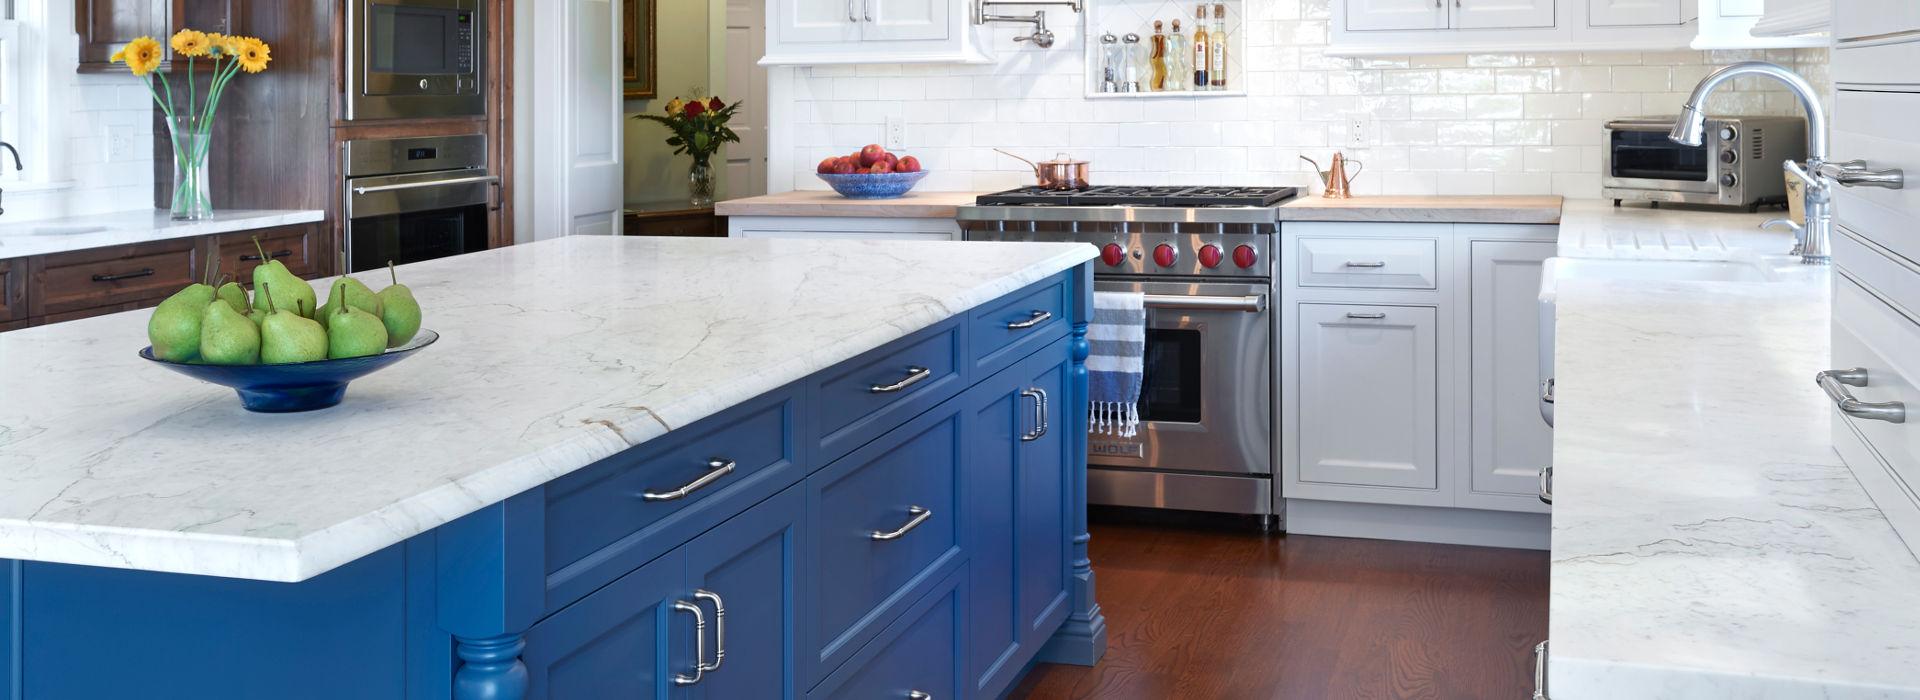 Charmant Granite, Marble, Quartz Countertop Fabricators, Stamford CT ...